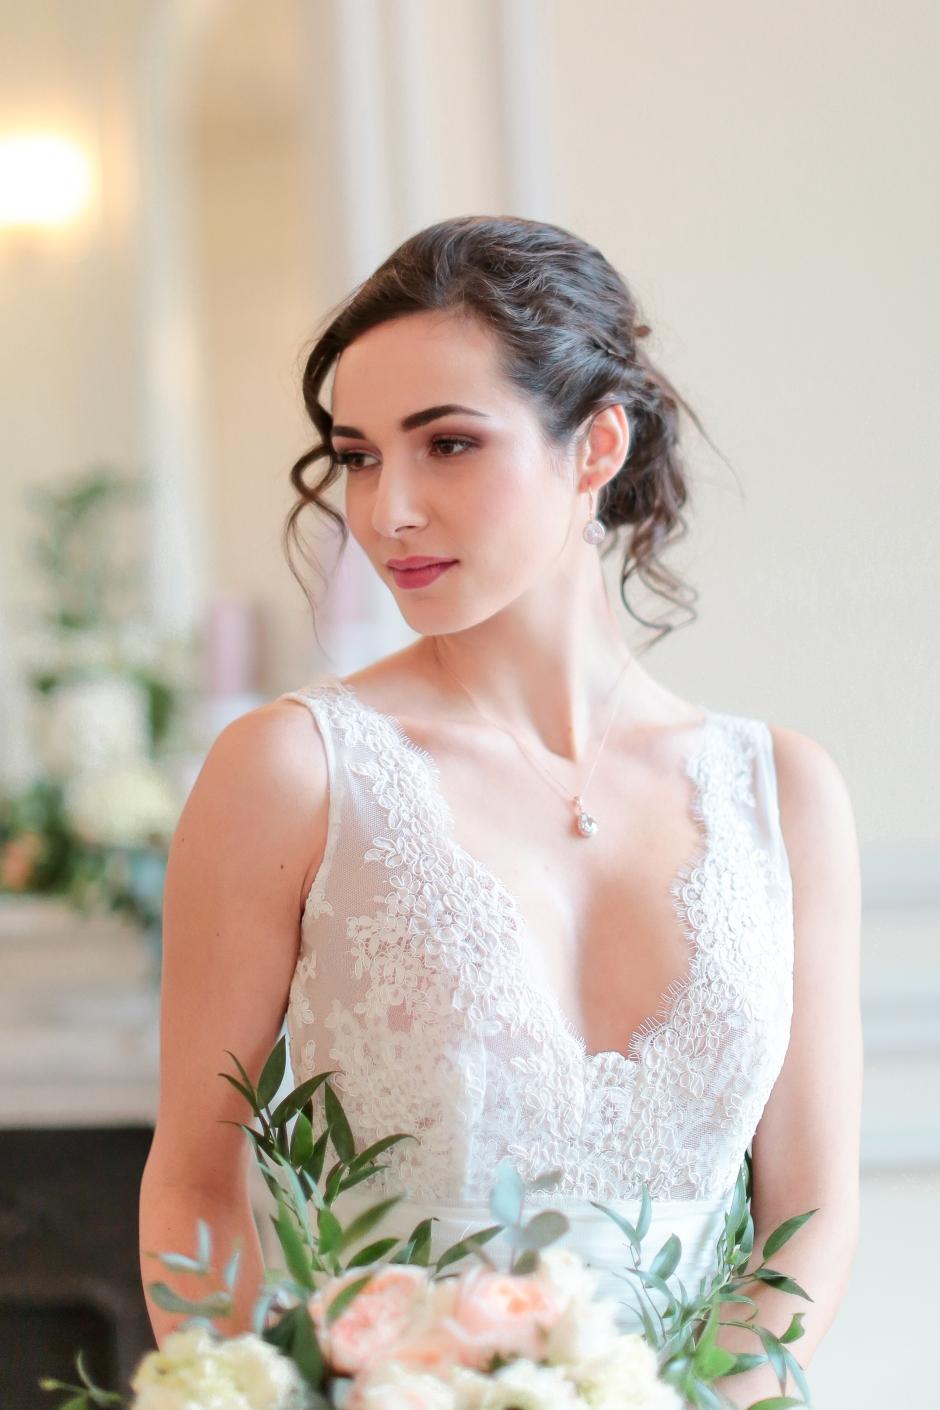 Mariage nude au Chateau de Santeny - La Blogueuse Mariage (5)